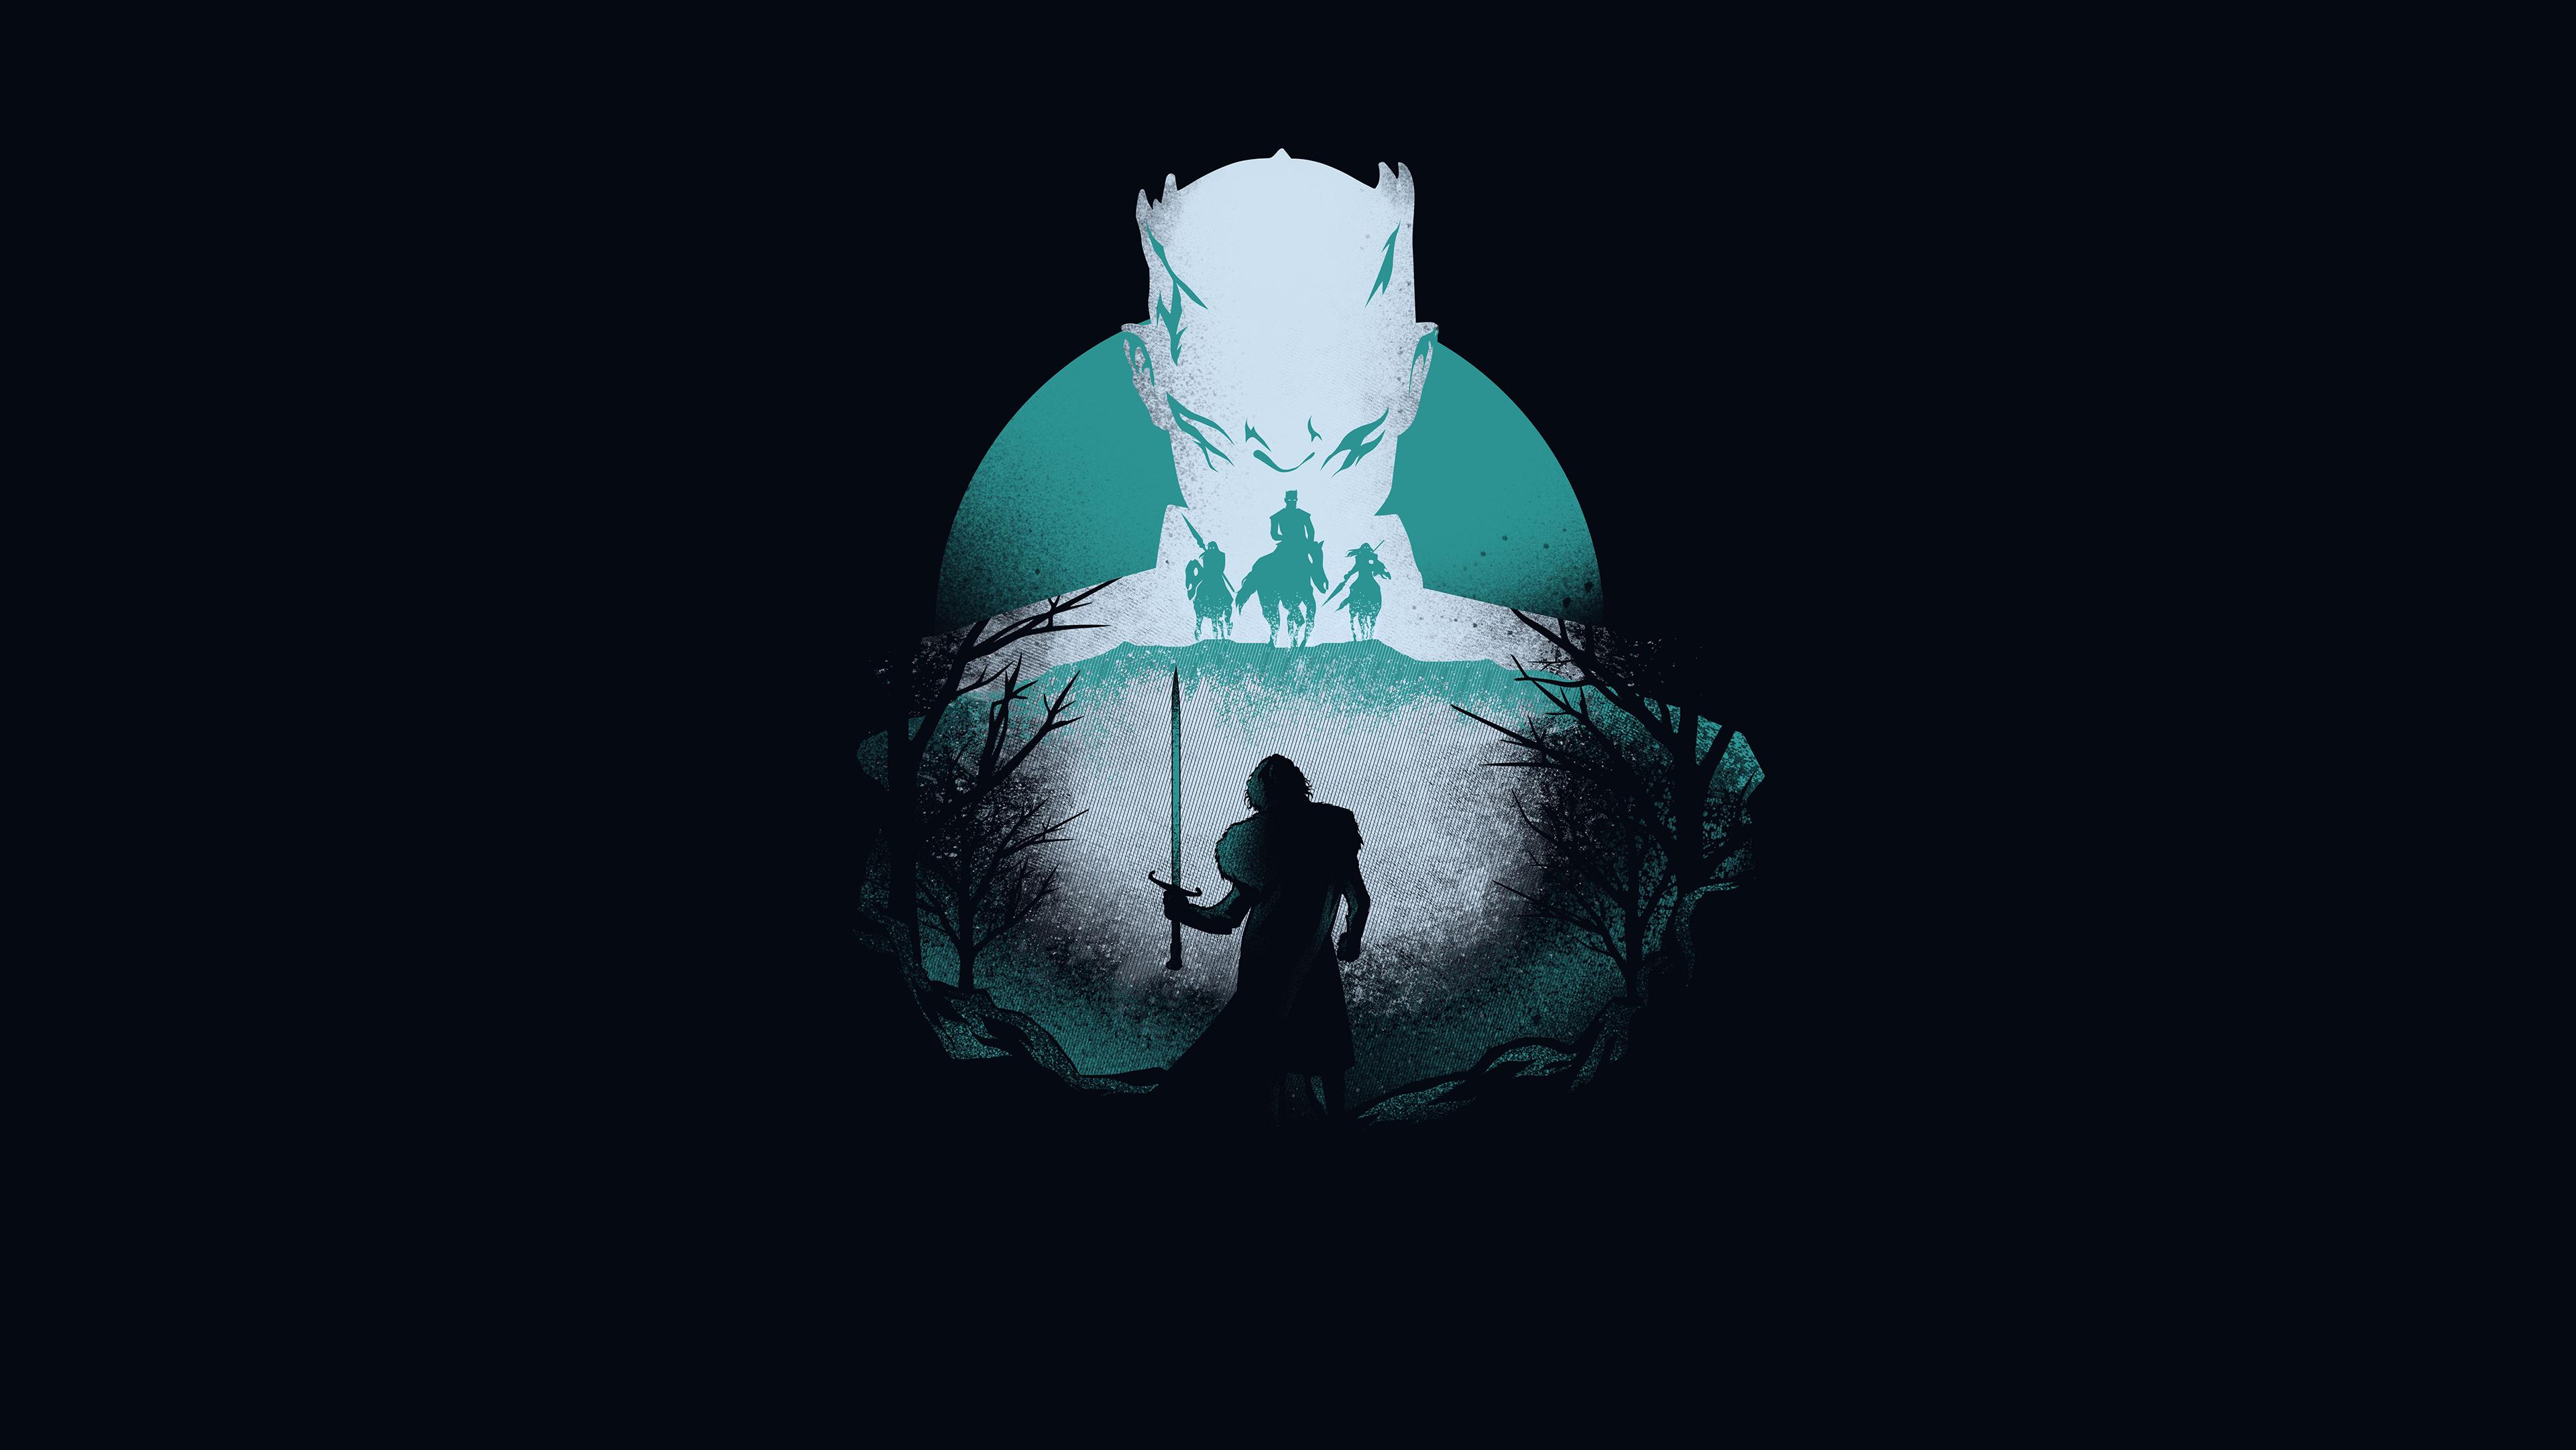 Night King Vs Wolf Game Of Thrones 8 Artwork Wallpaper Hd Tv